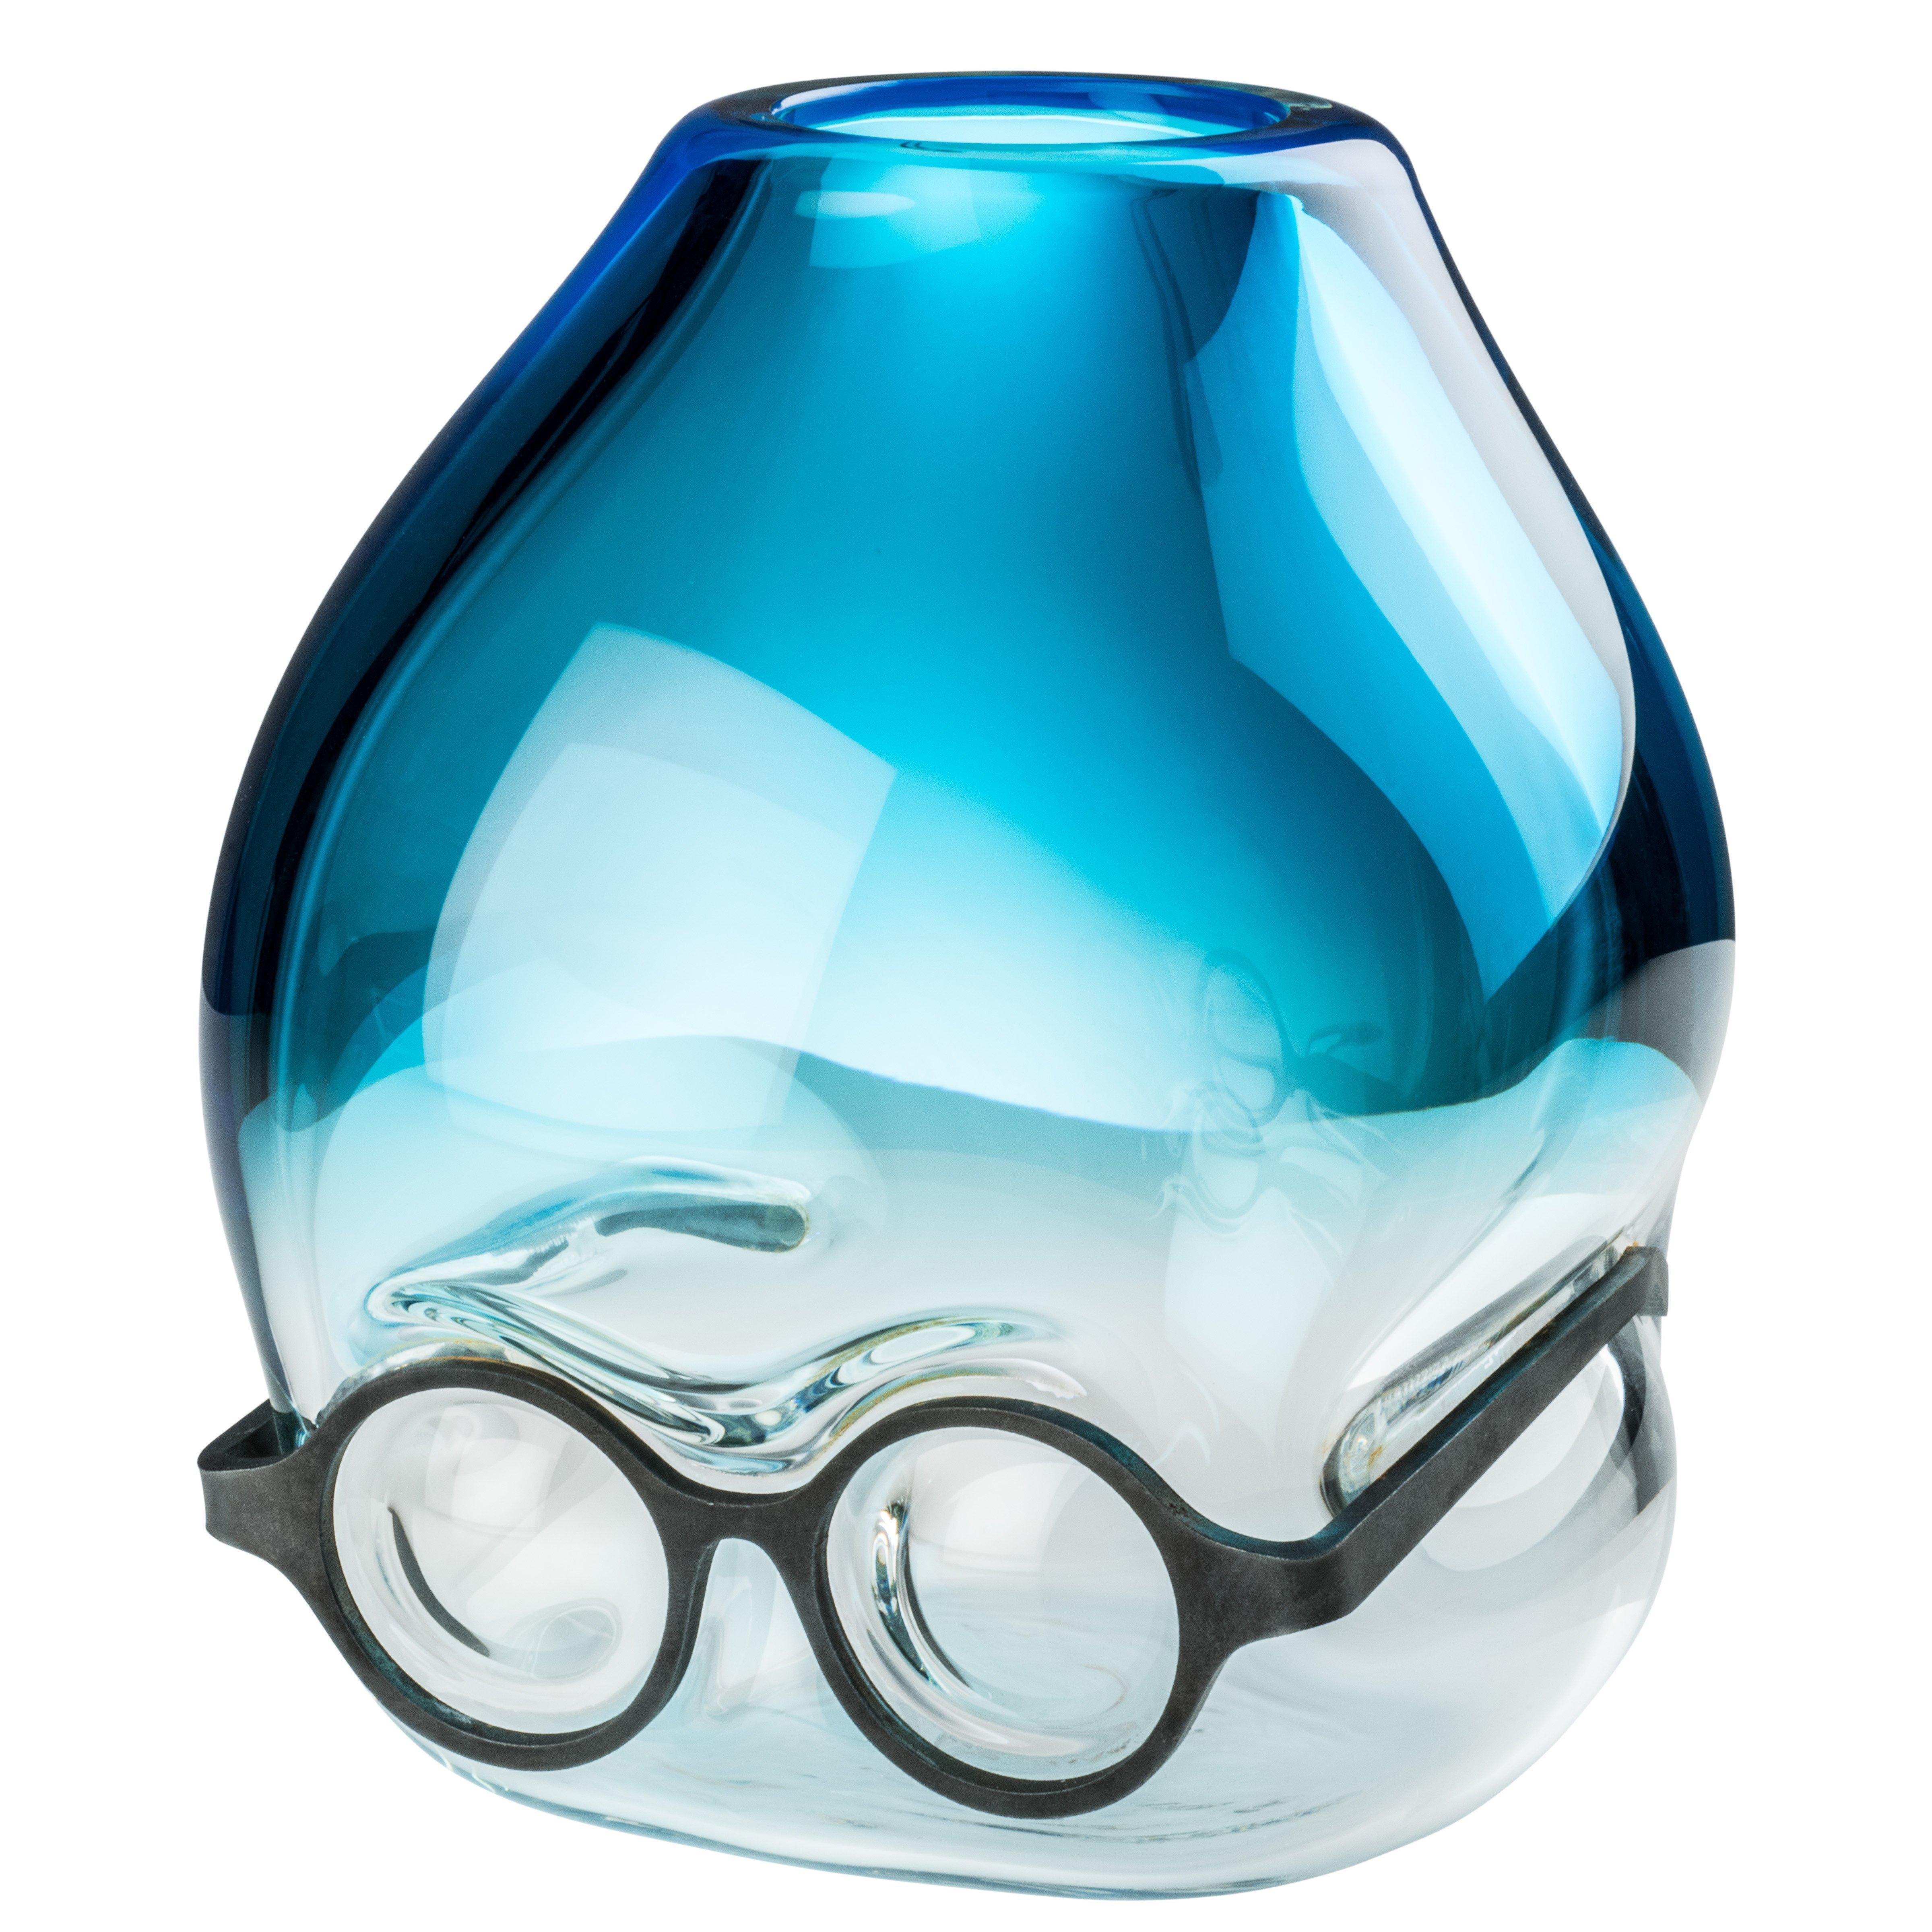 Venini 'Where Are My Glasses?' Glass Vase in Aquamarine & Crystal by Ron Arad